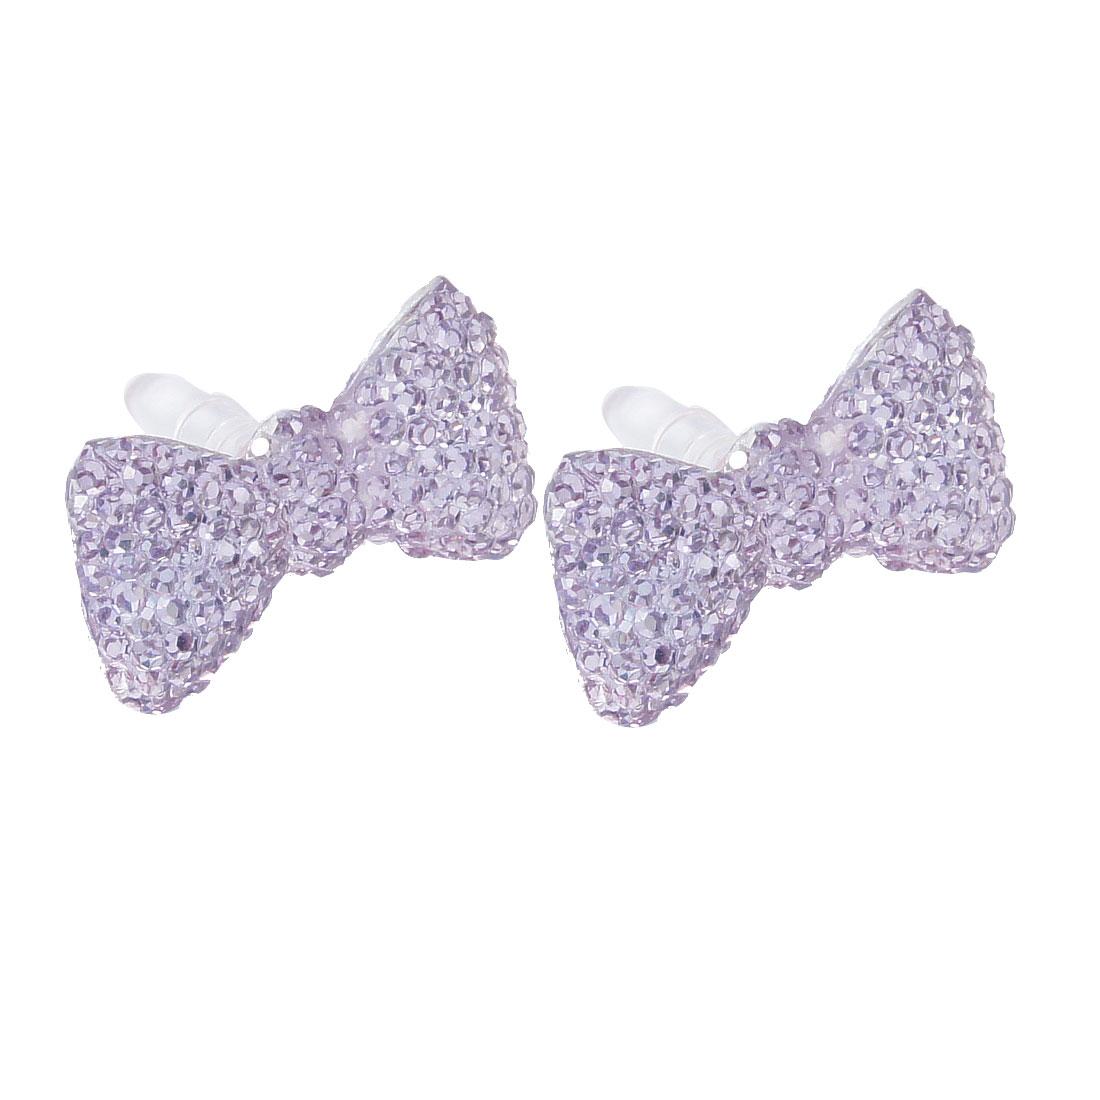 2 x Glitter Light Purple Crystal Bow 3.5mm Anti Dust Earphone Plug